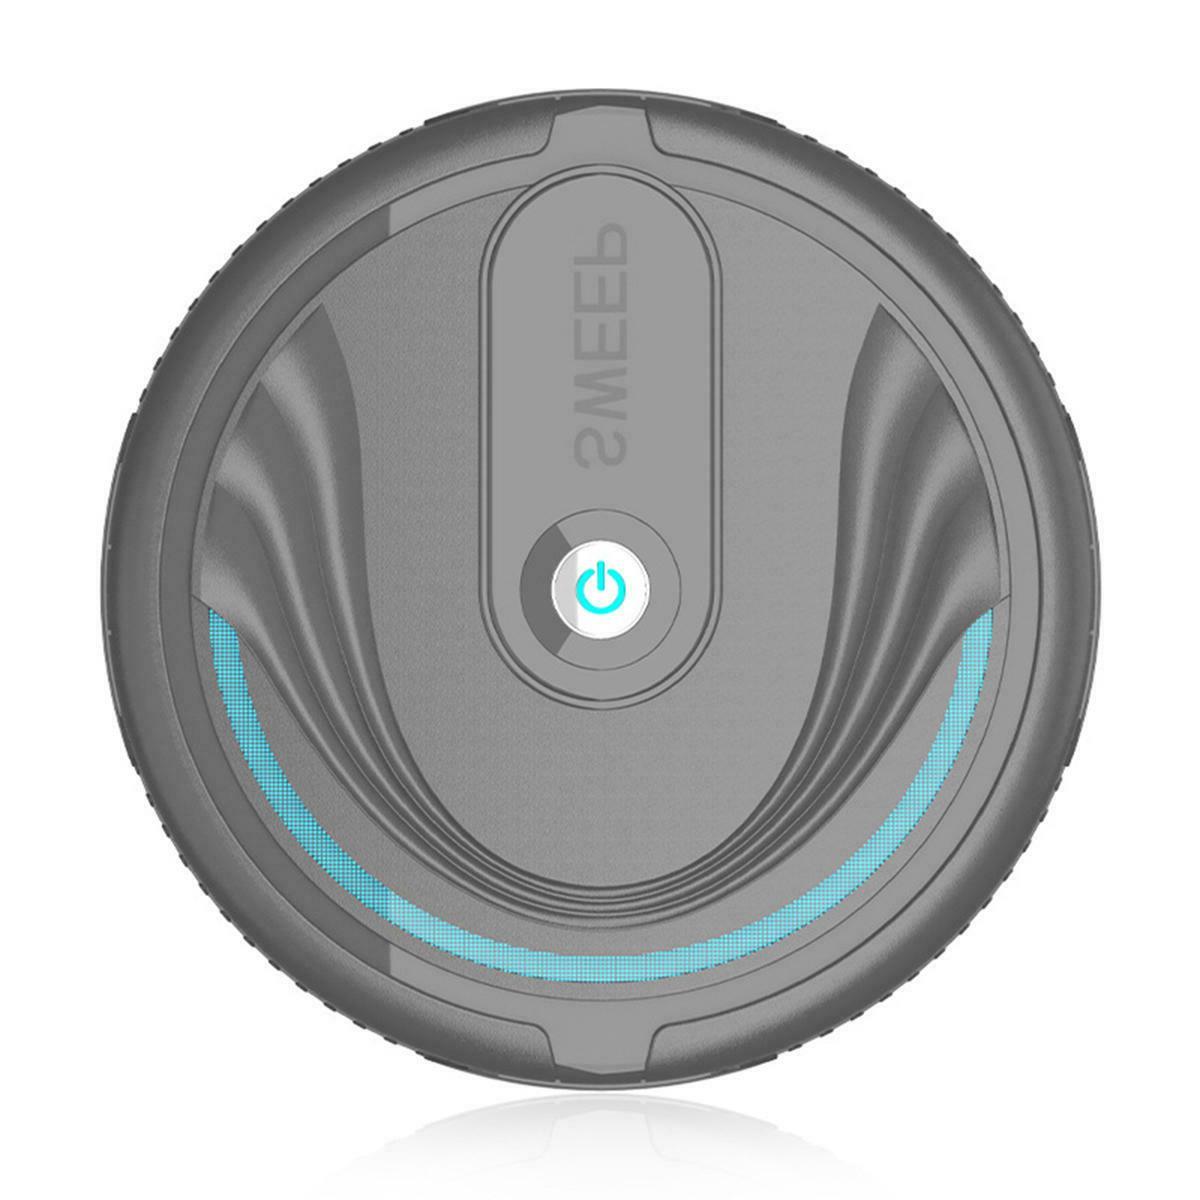 Automatic Smart Robot Vacuum Cleaner